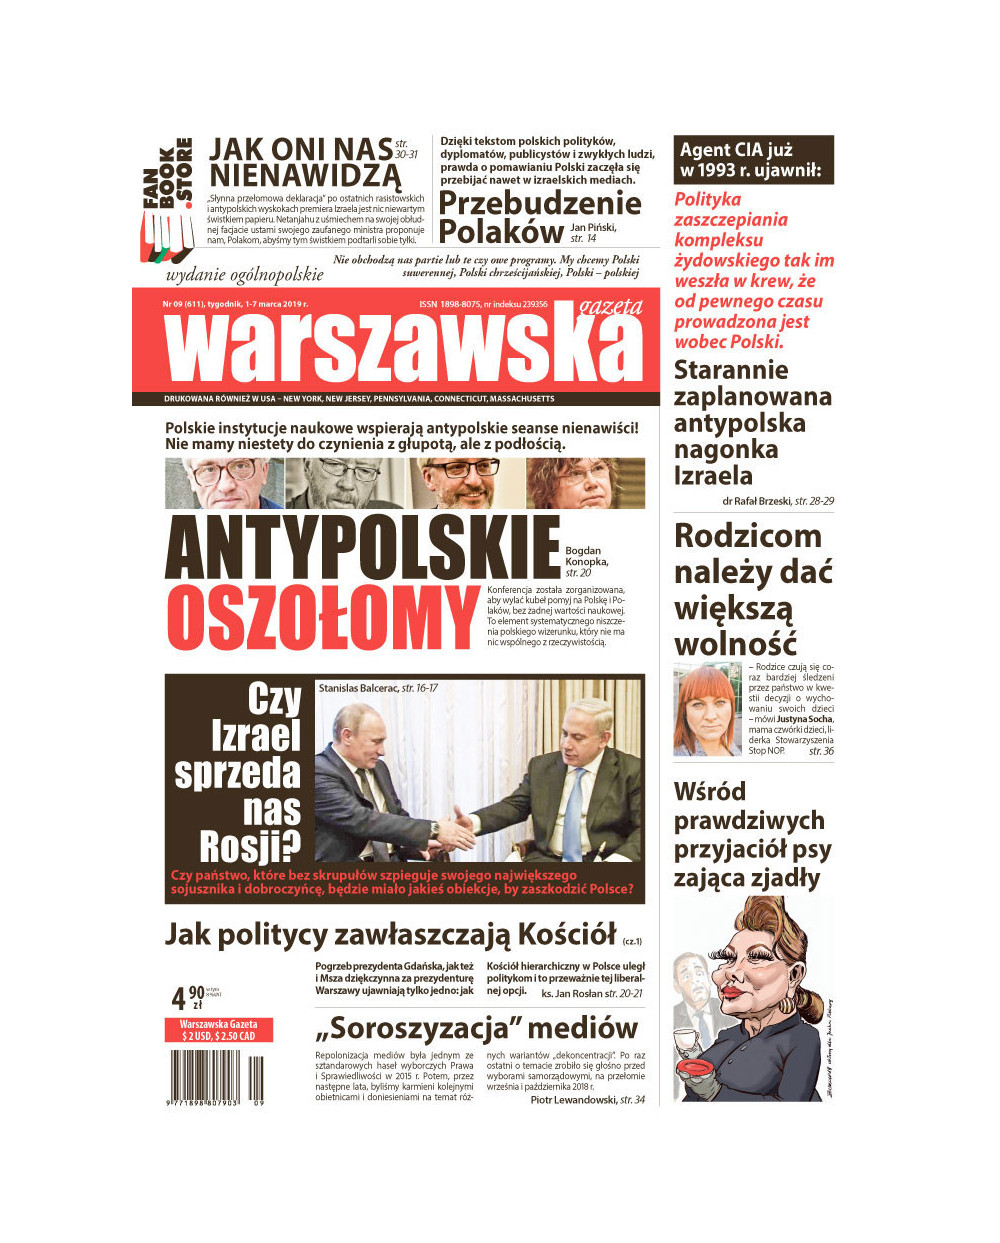 Warszawska Gazeta 09/2019